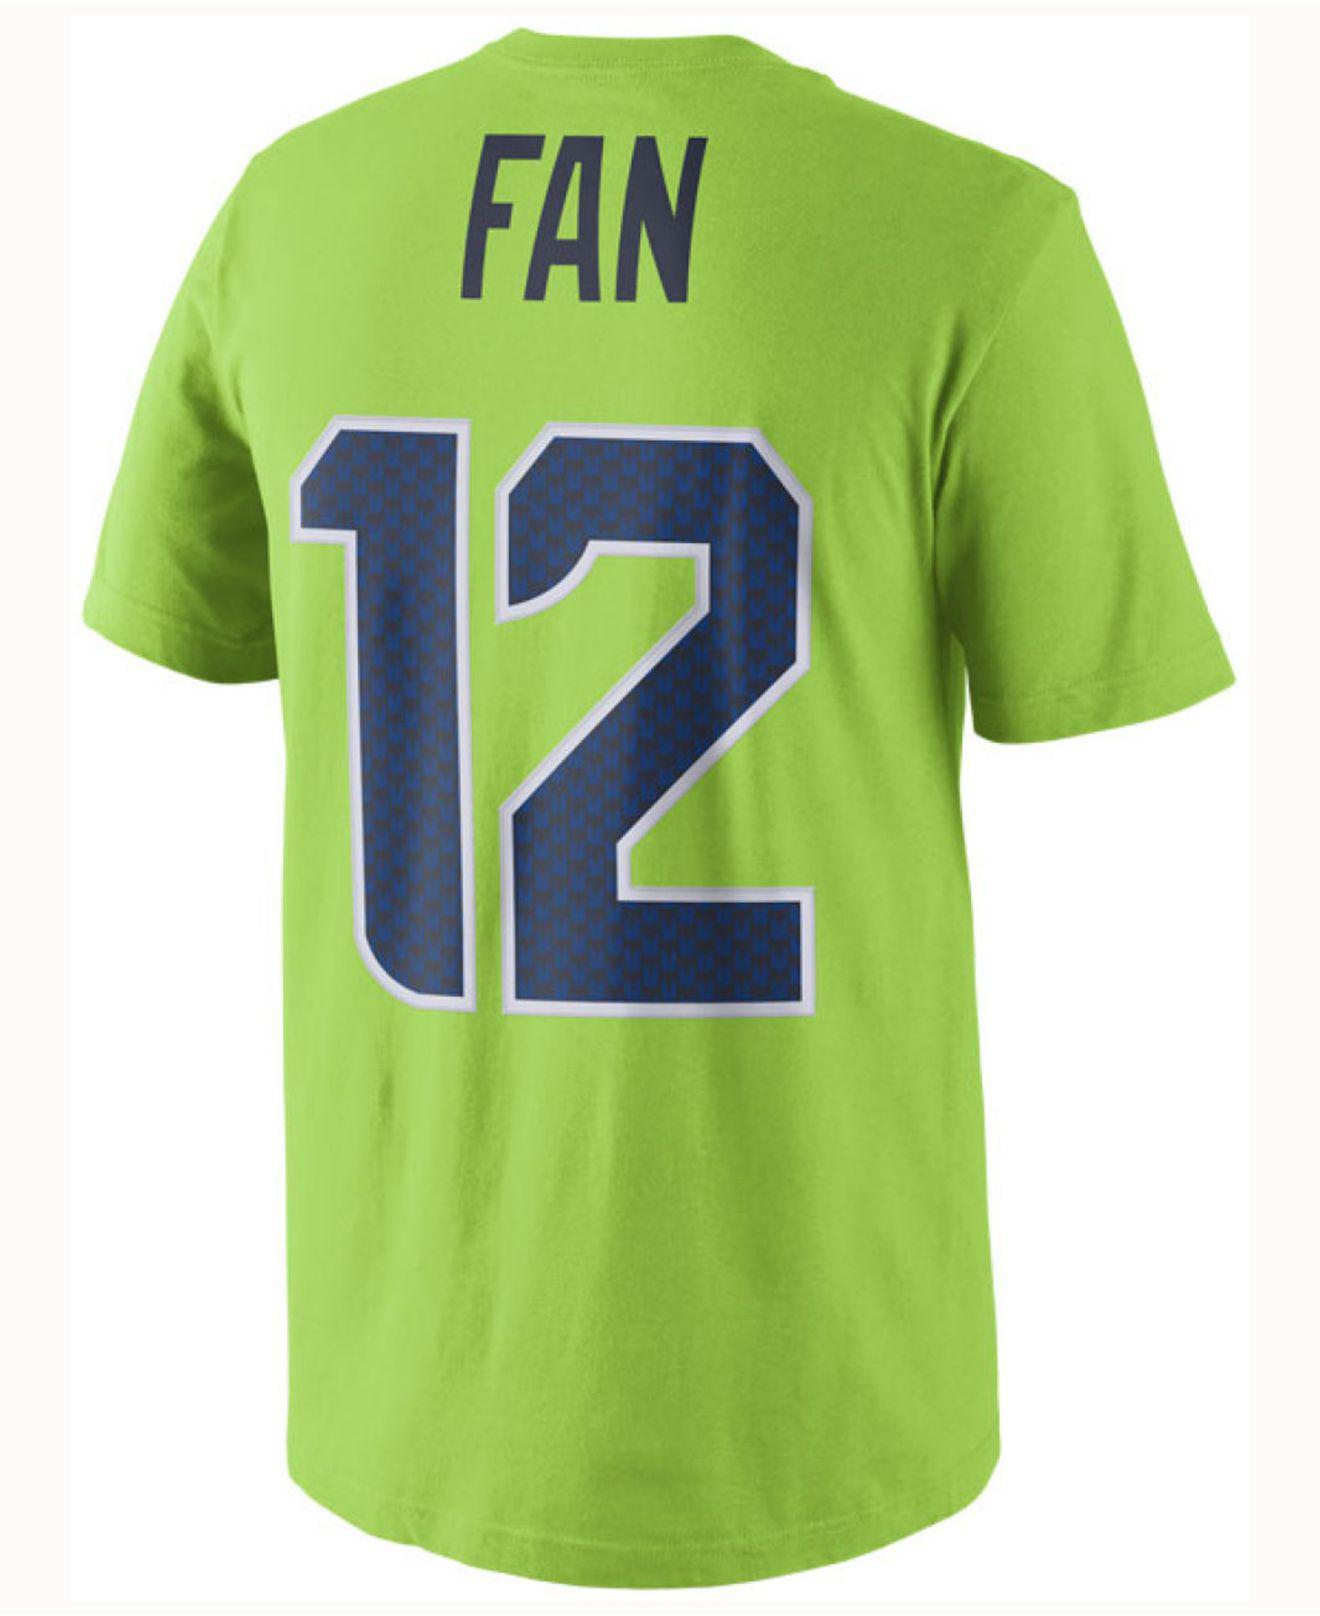 8175a3ea8 Nike. Green Men s Fan  12 Seattle Seahawks Color Rush Name   Number T-shirt